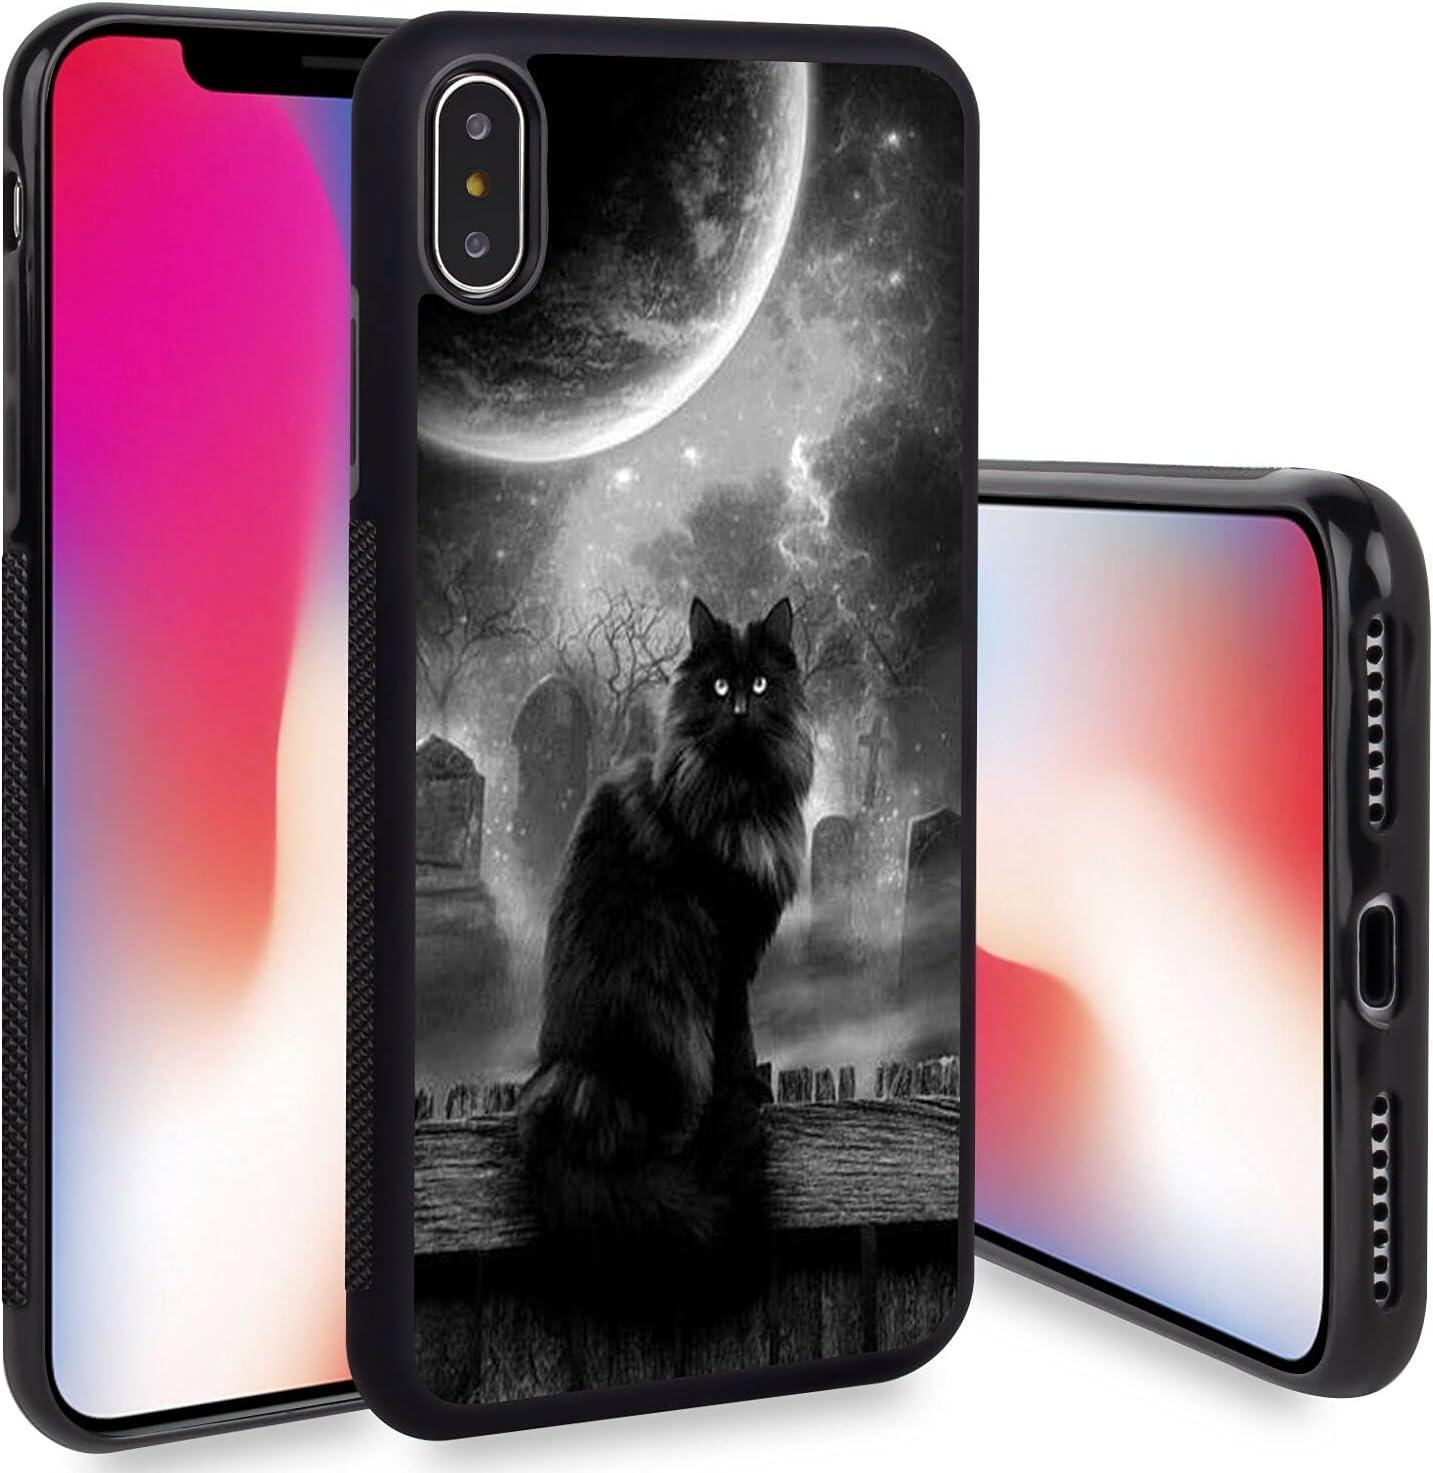 HAIGUQI iPhone X iPhone Xs Case Black Cat Pattern Shockproof Slim TPU Rubber Material Black Frame Cellphone Mobile Case